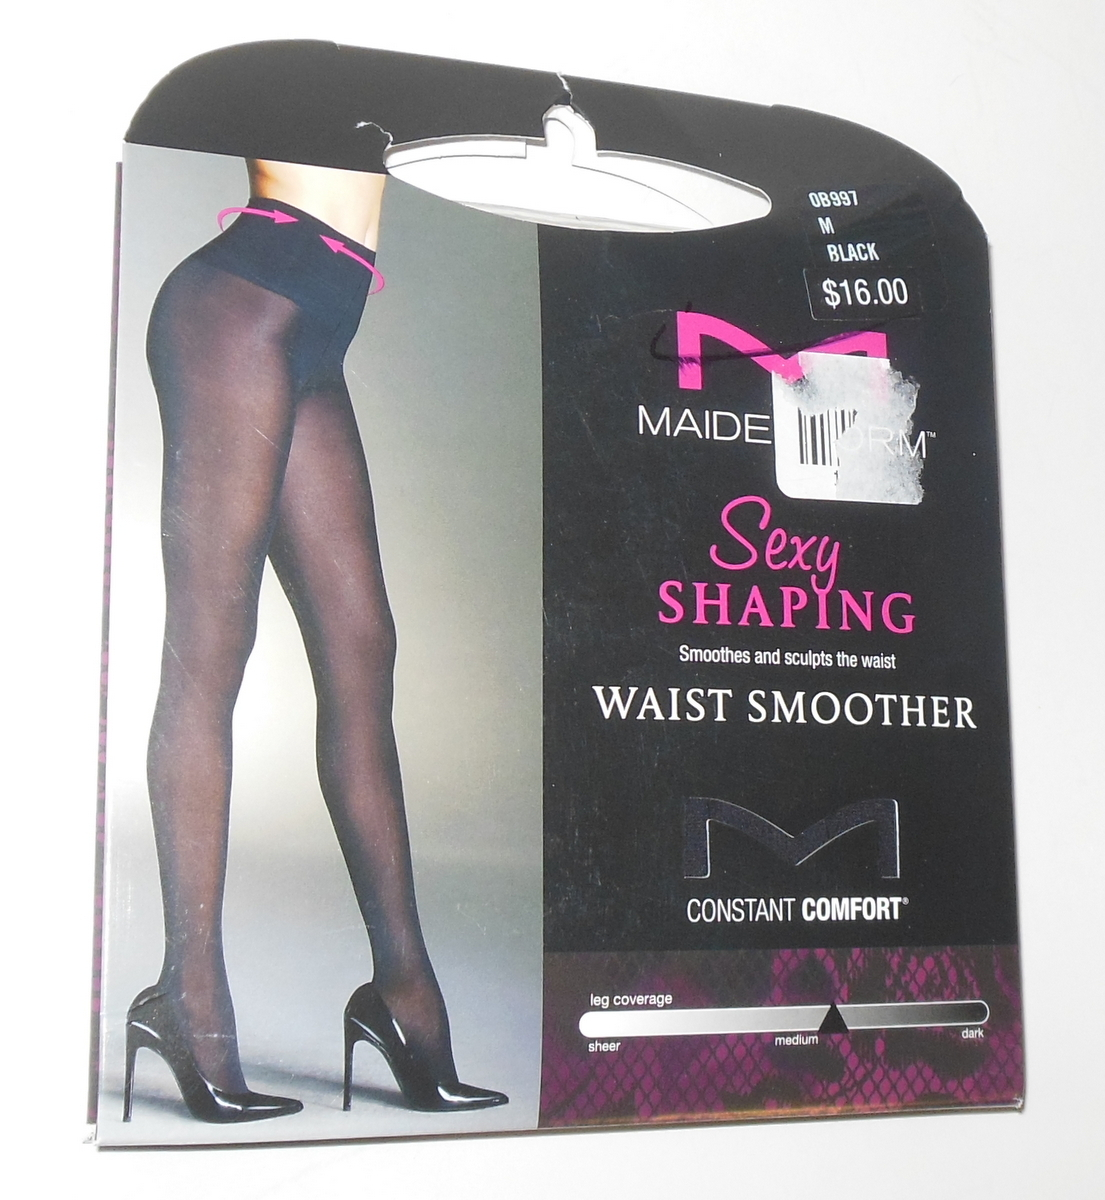 41798005257 Maidenform Pantyhose Shaping Waist Smoother 60 Denier M Black Full Matte  Opaque